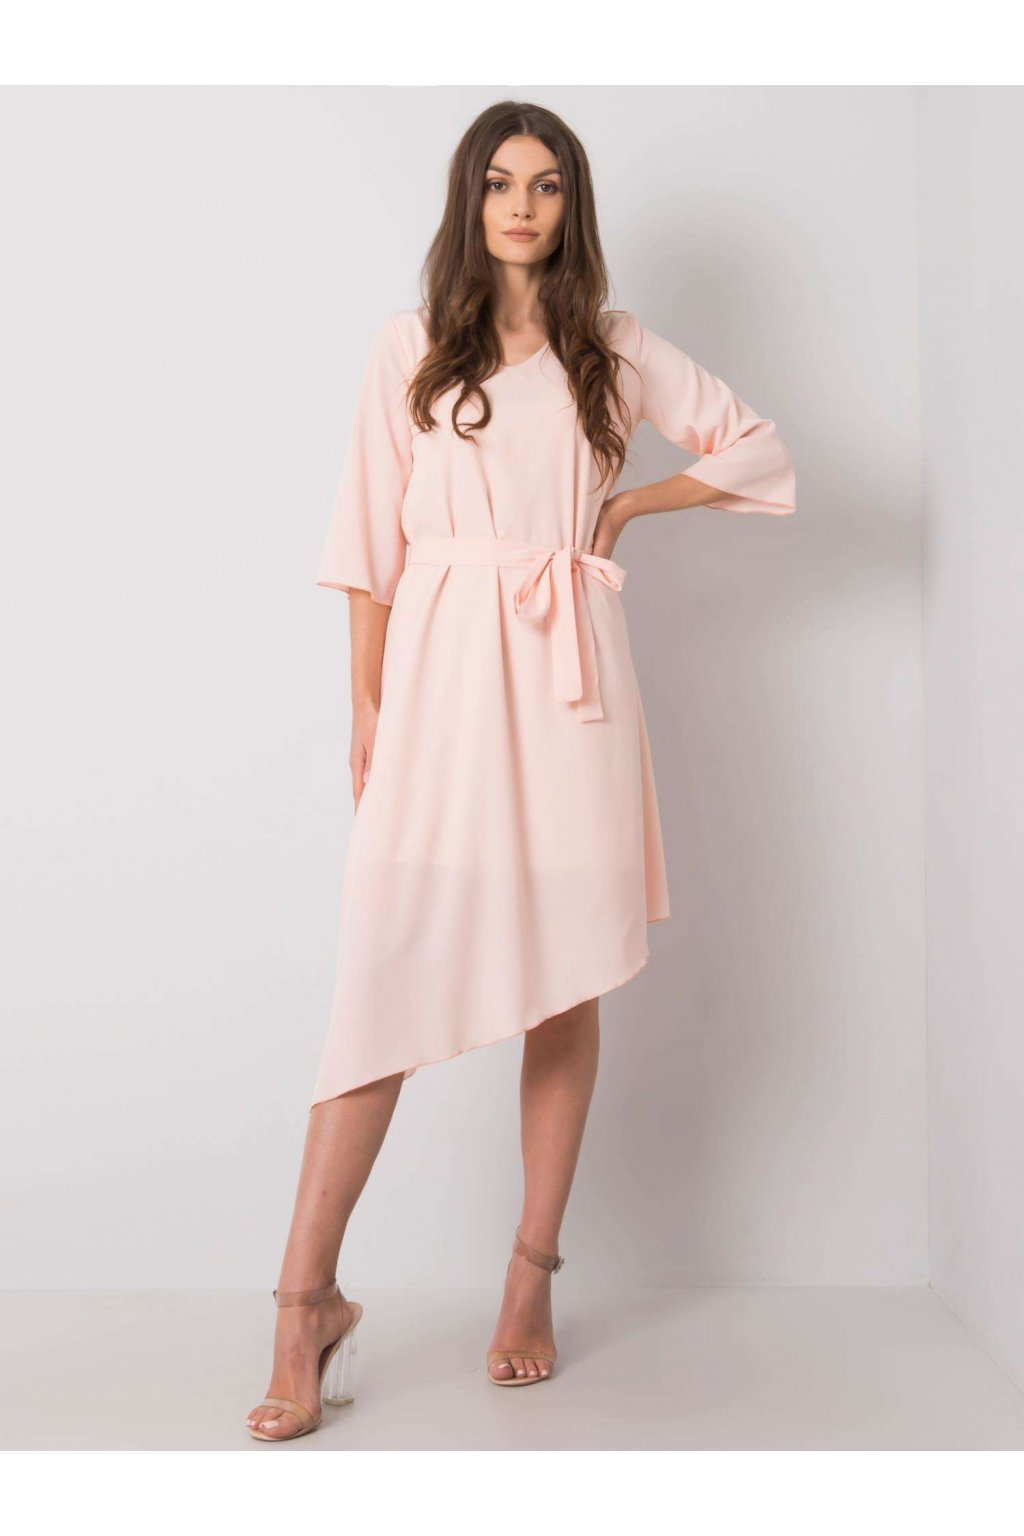 pol pl Jasnorozowa sukienka Imene 366997 1